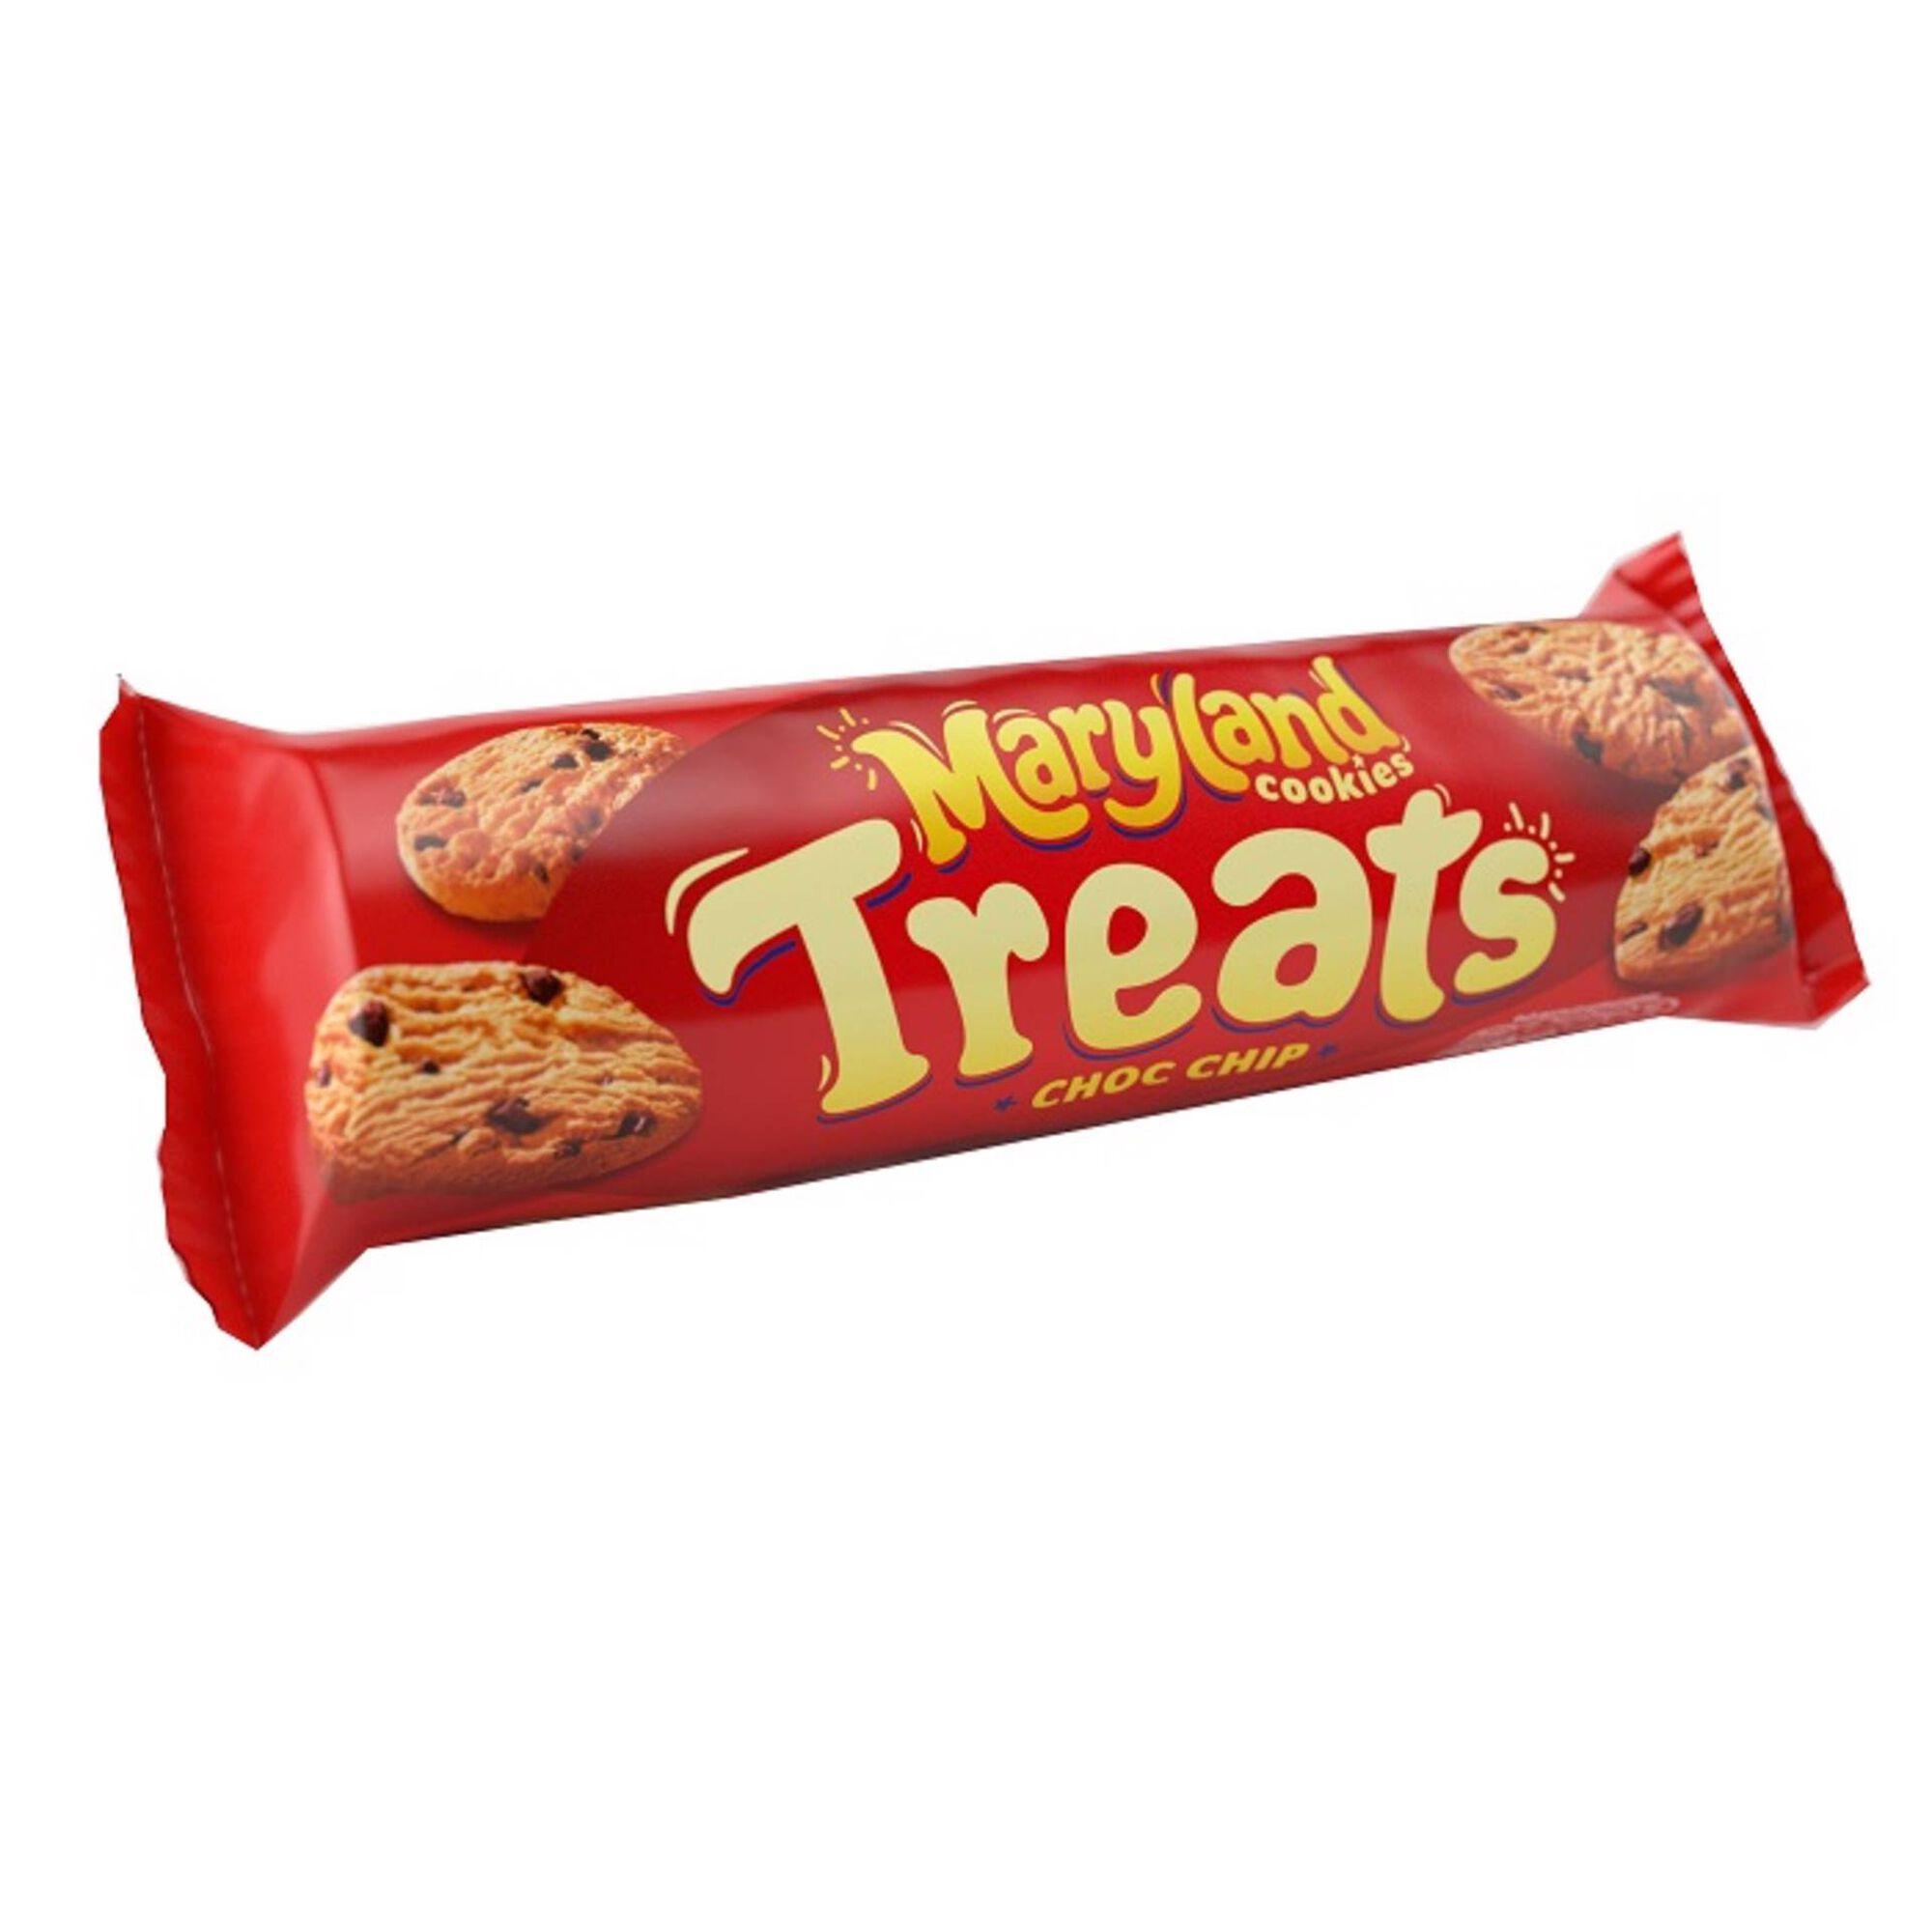 Bolachas Cookies Treats Chocolate